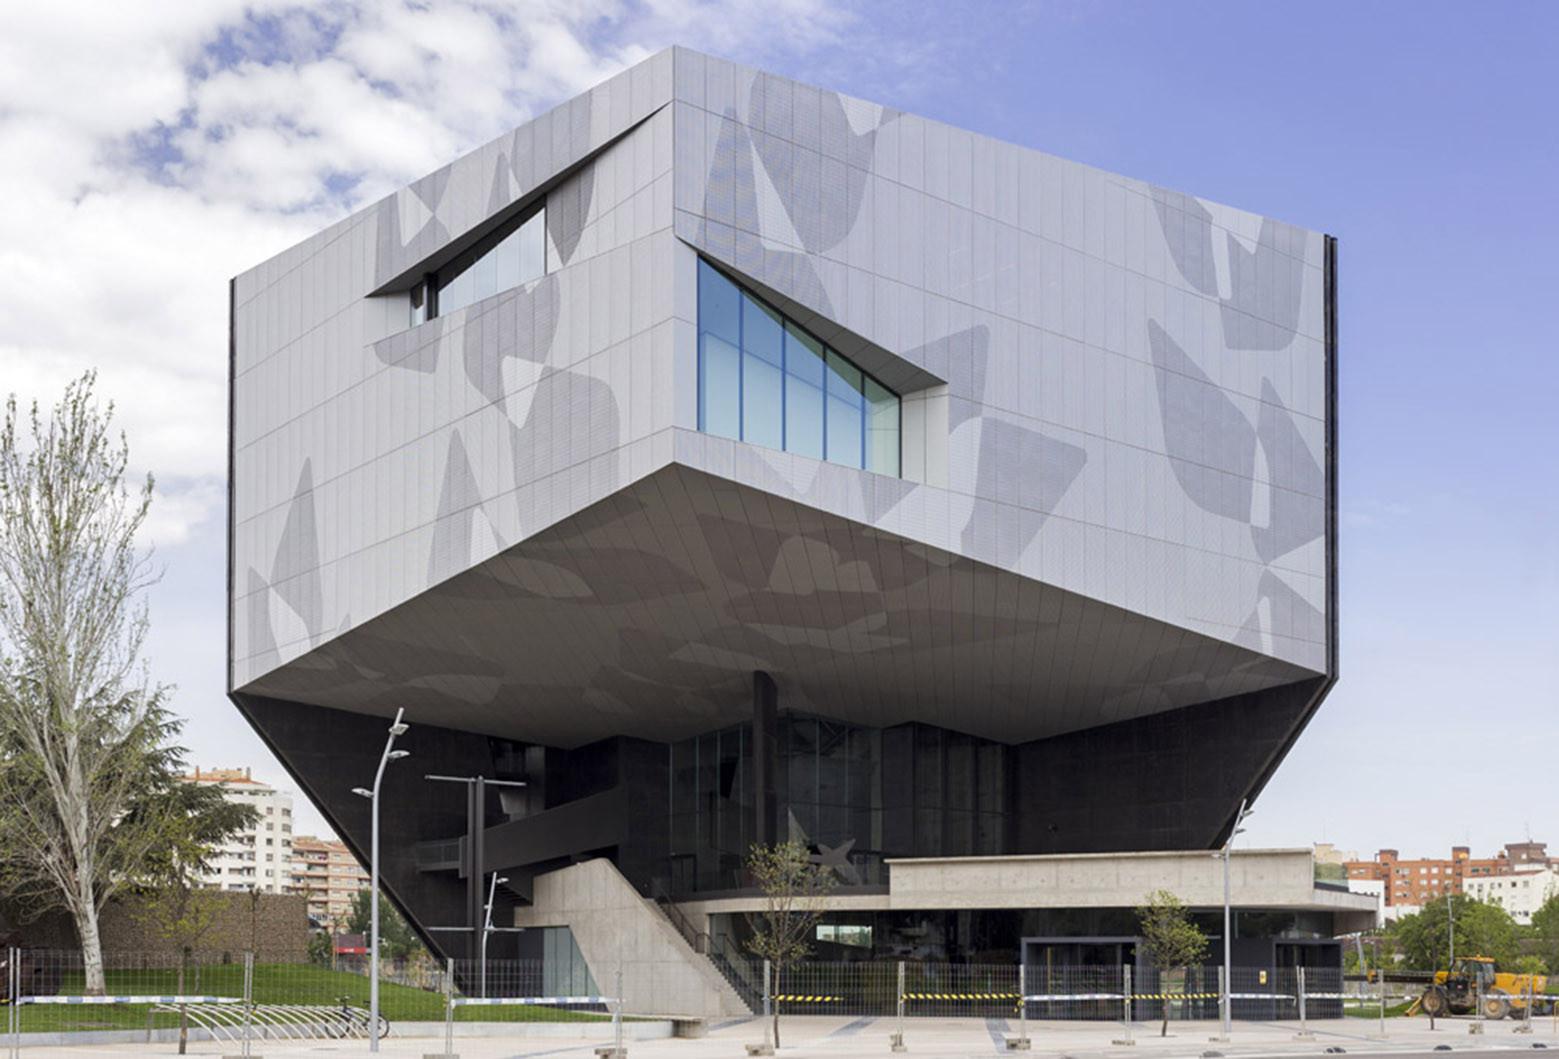 Caixaforum zaragoza estudio carme pinos plataforma arquitectura - Estudio arquitectura zaragoza ...